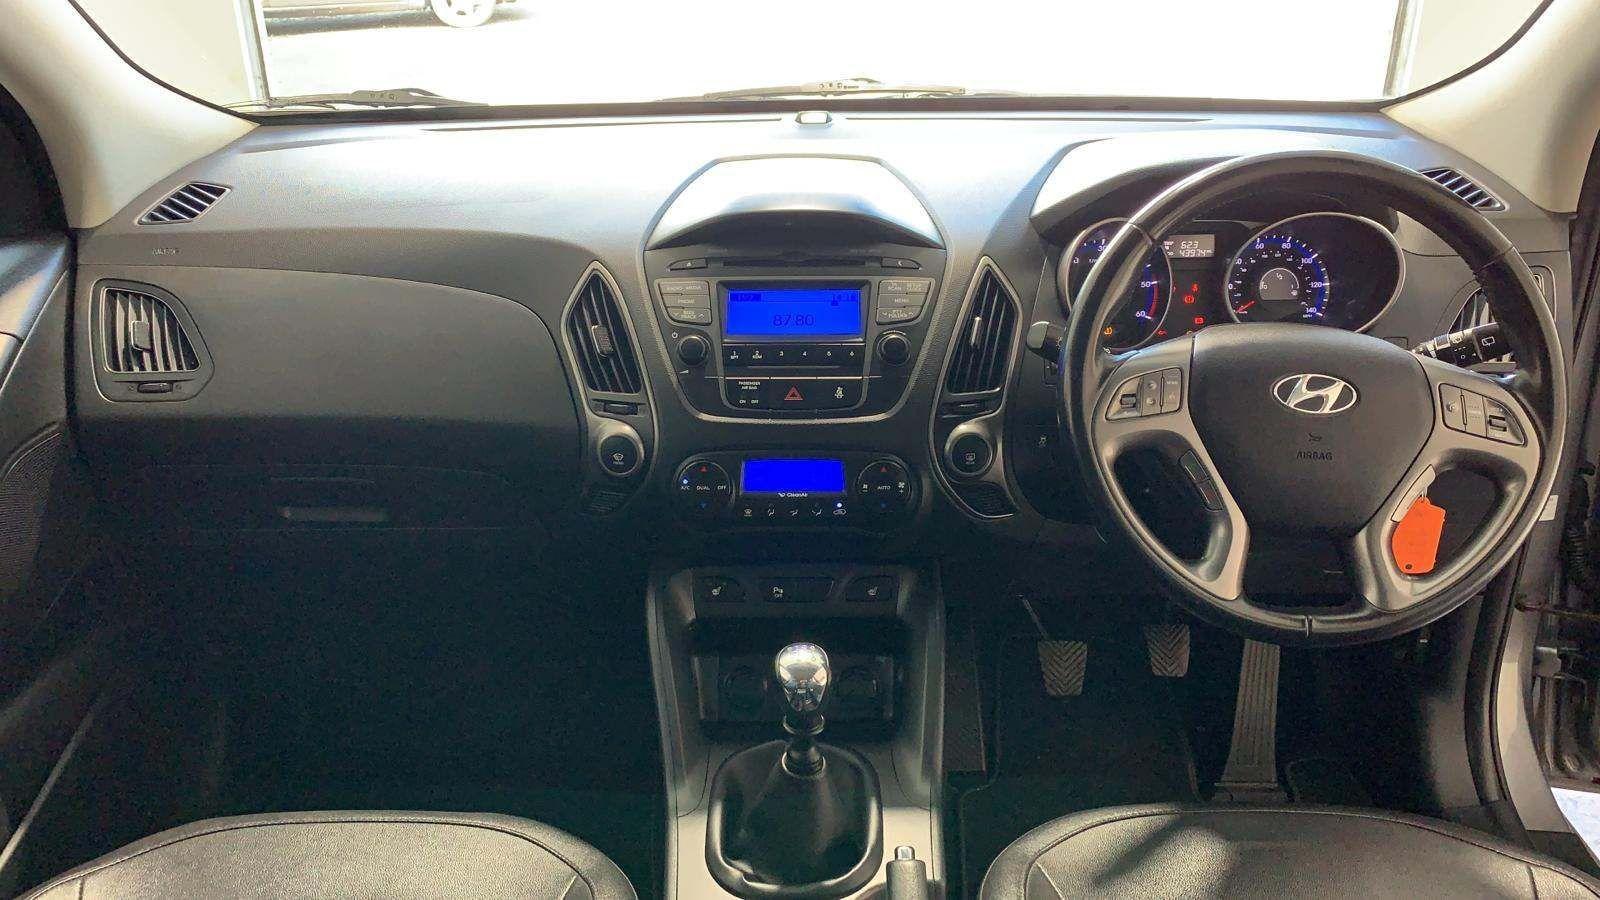 2014 HYUNDAI ix35 1.7 CRDi SE Diesel Manual *TOW BAR* – J R S Commercials And Cars Dungannon full